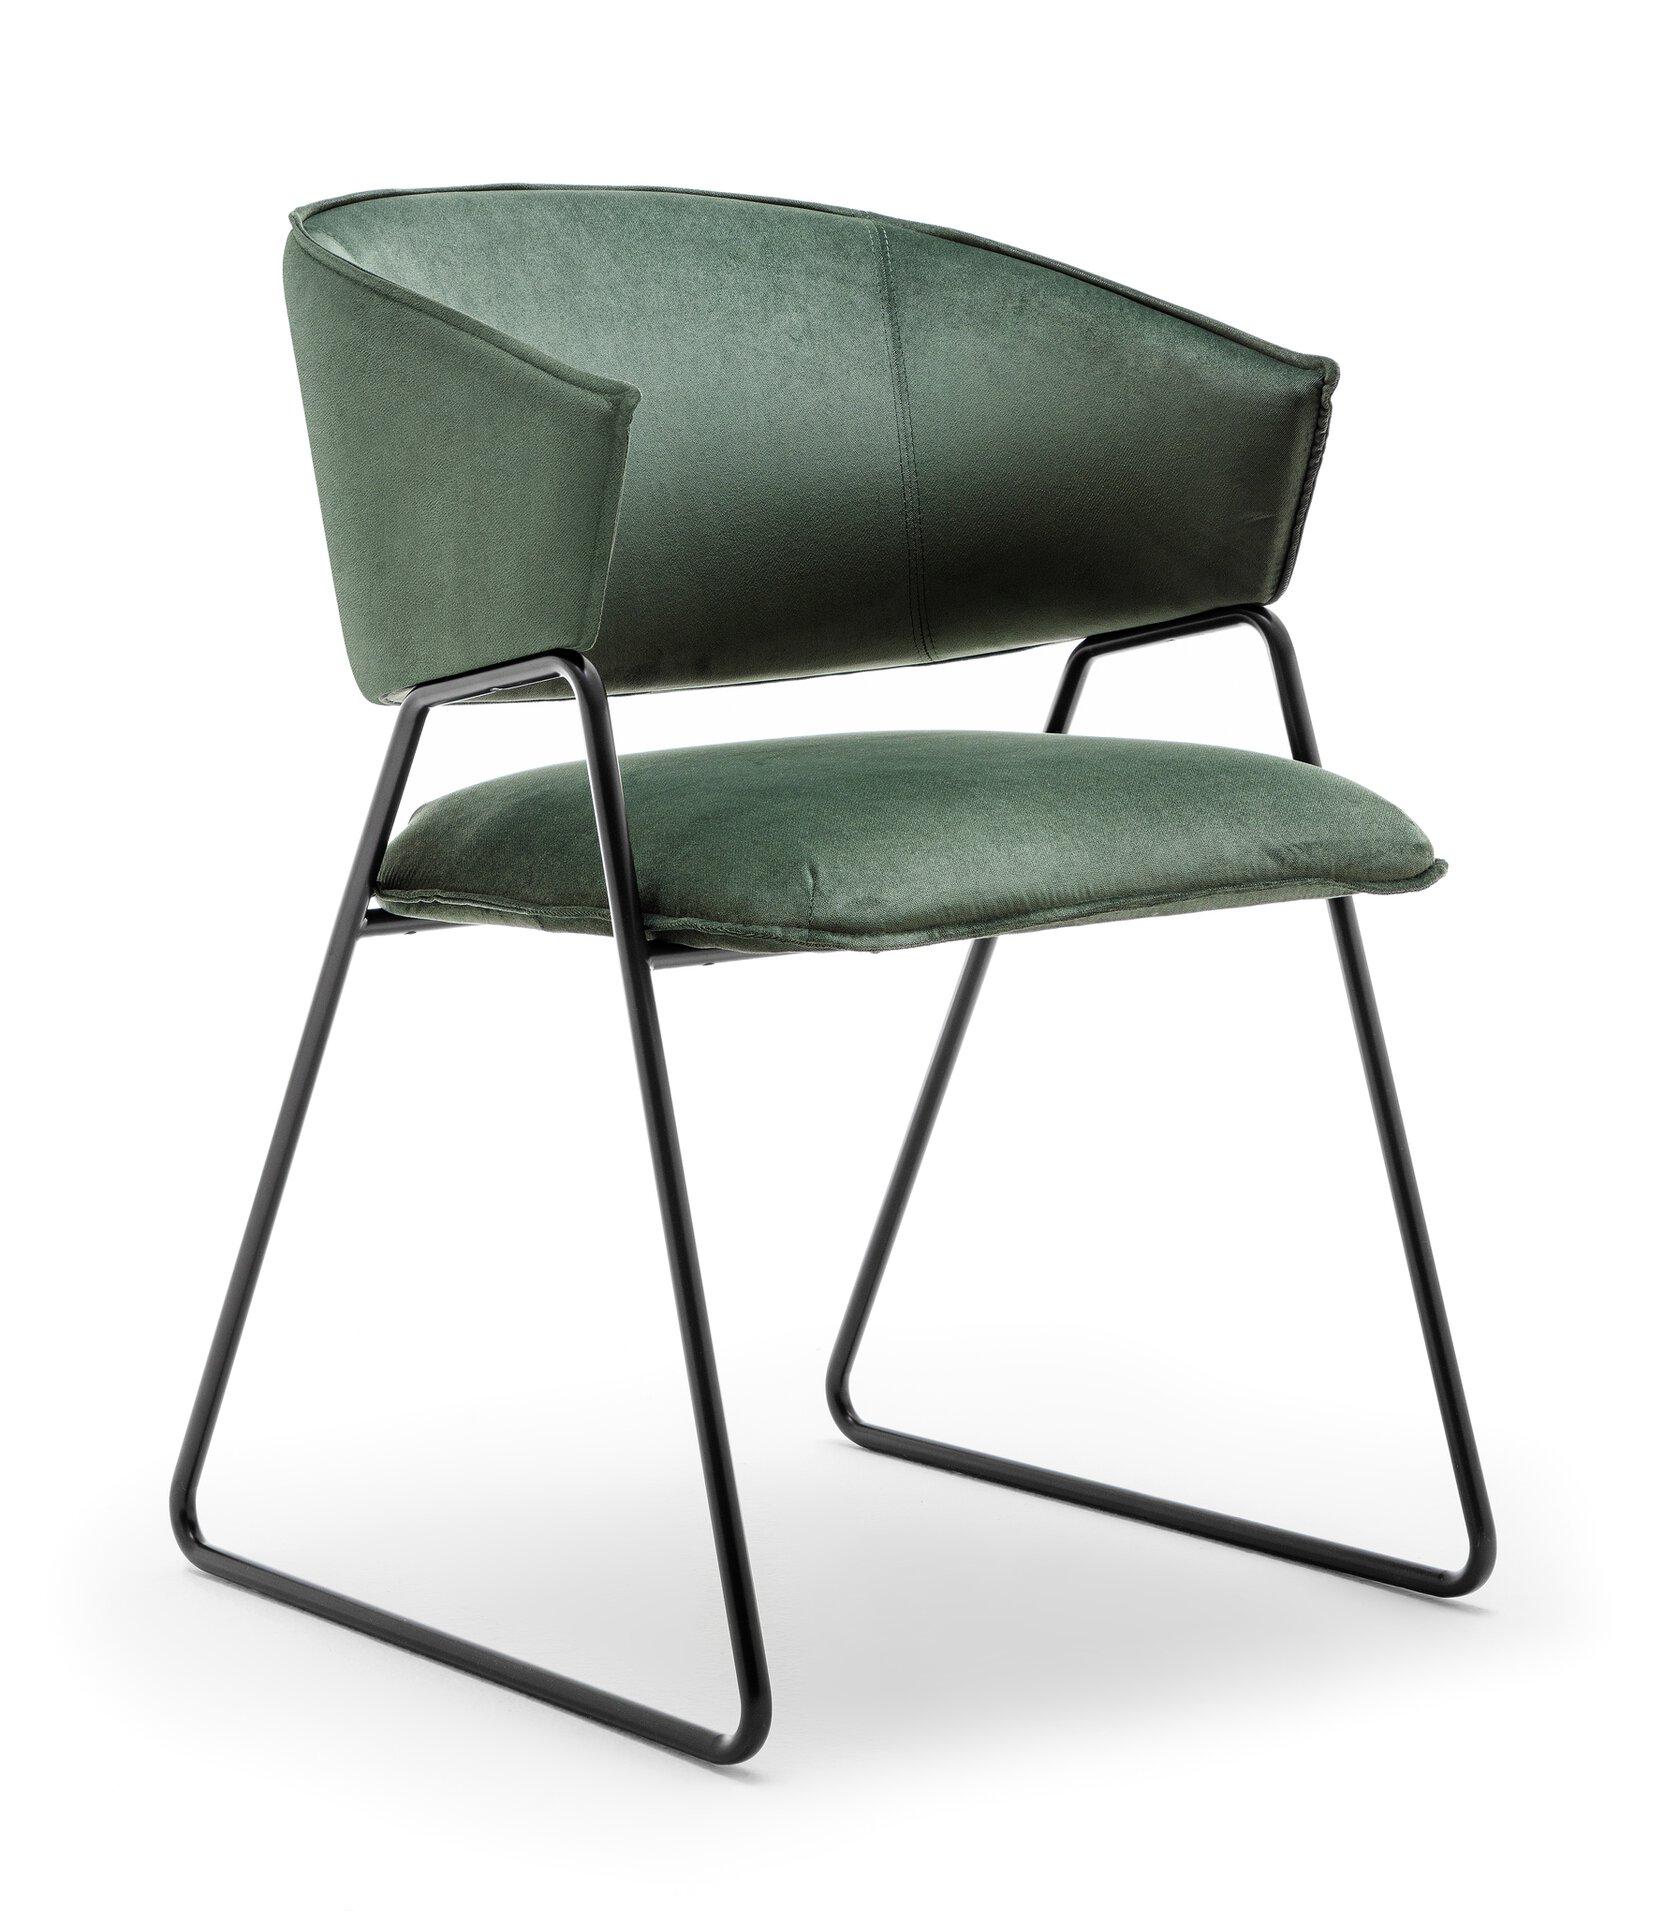 Stuhl Style Gwinner Textil mehrfarbig 57 x 83 x 54 cm